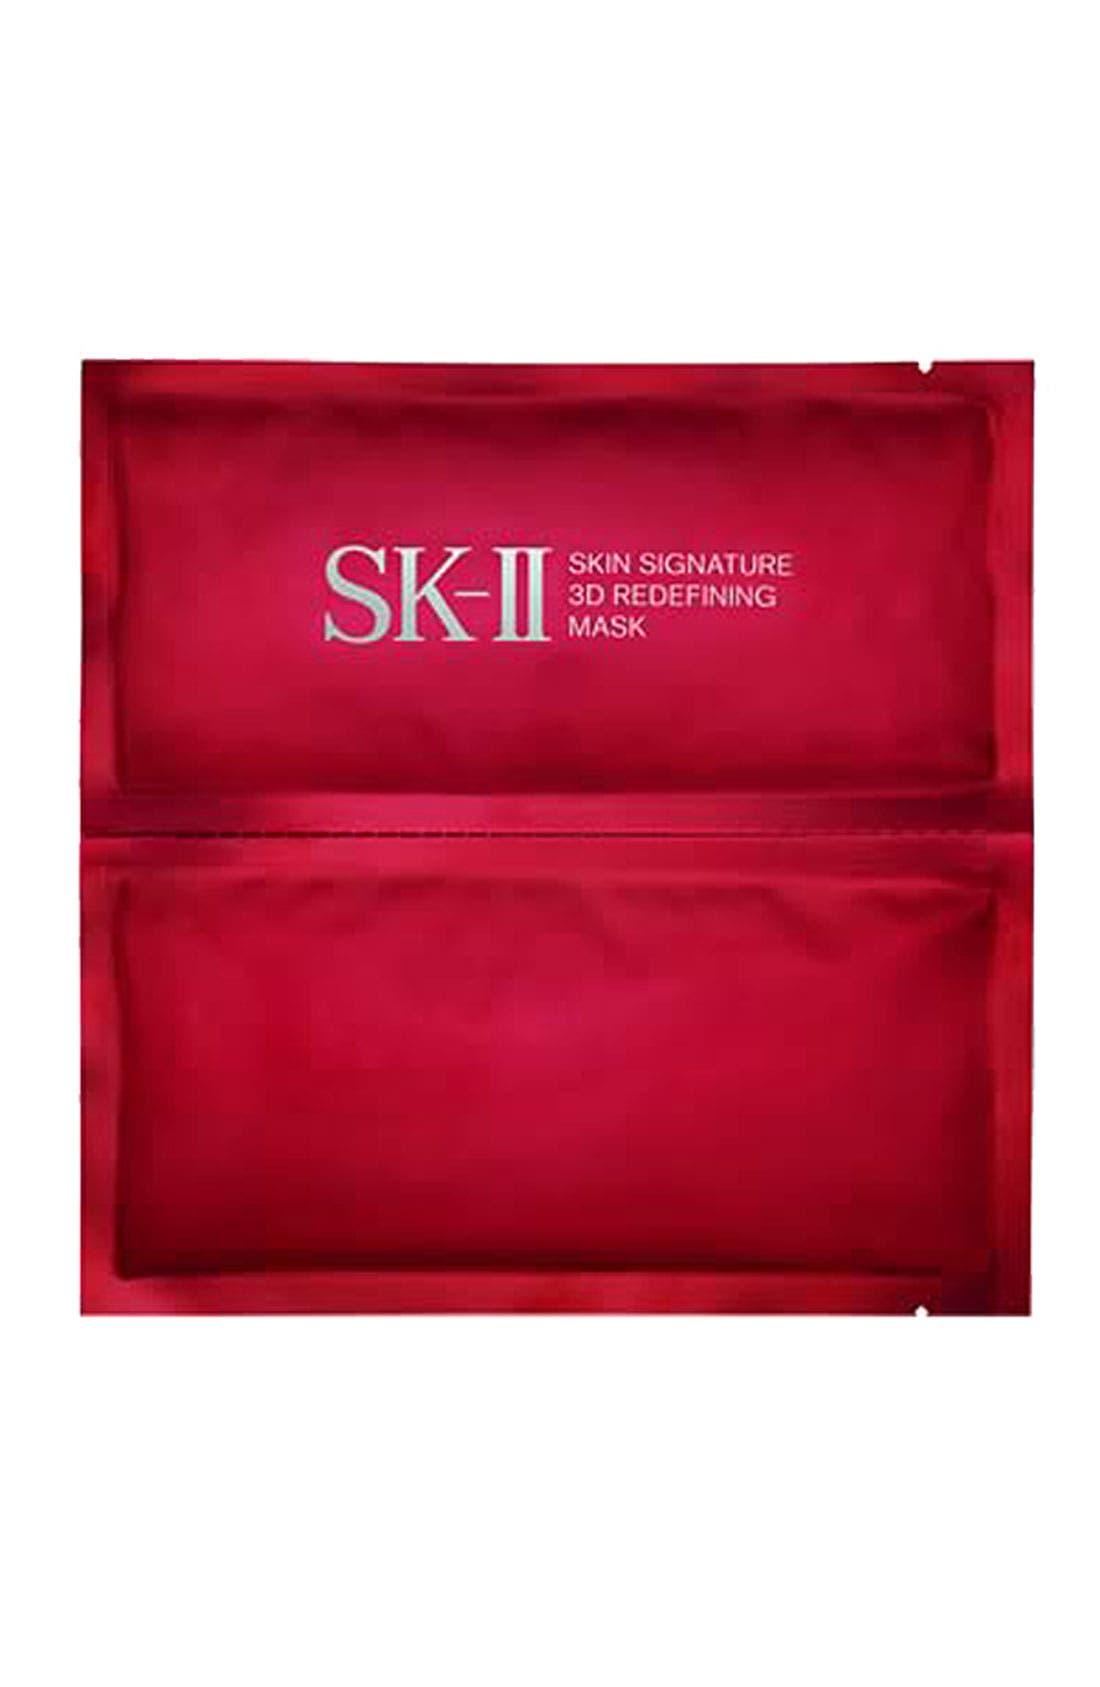 SK-II 'Skin Signature' 3D Redefining Mask